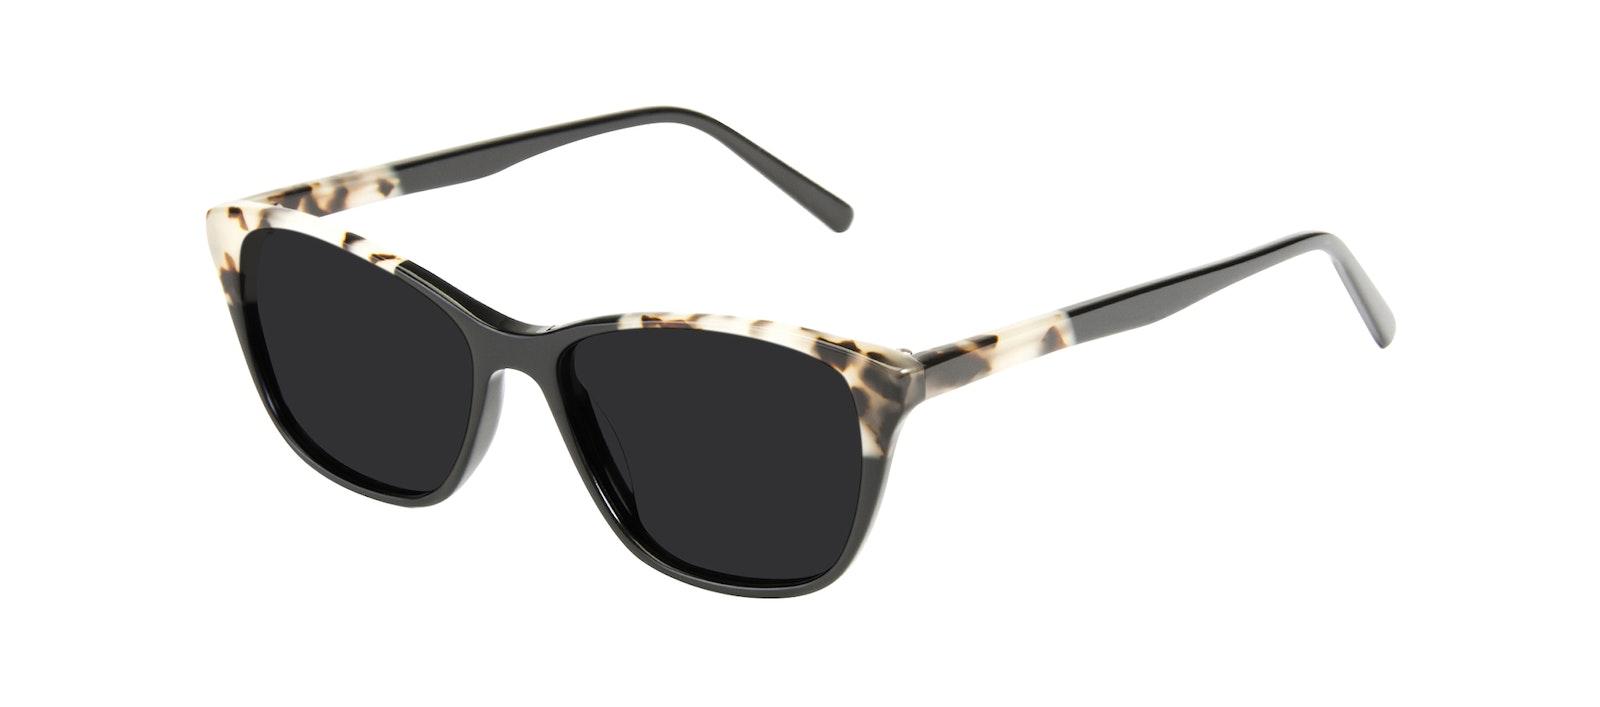 Affordable Fashion Glasses Cat Eye Sunglasses Women Myrtle Petite Ebony Granite Tilt